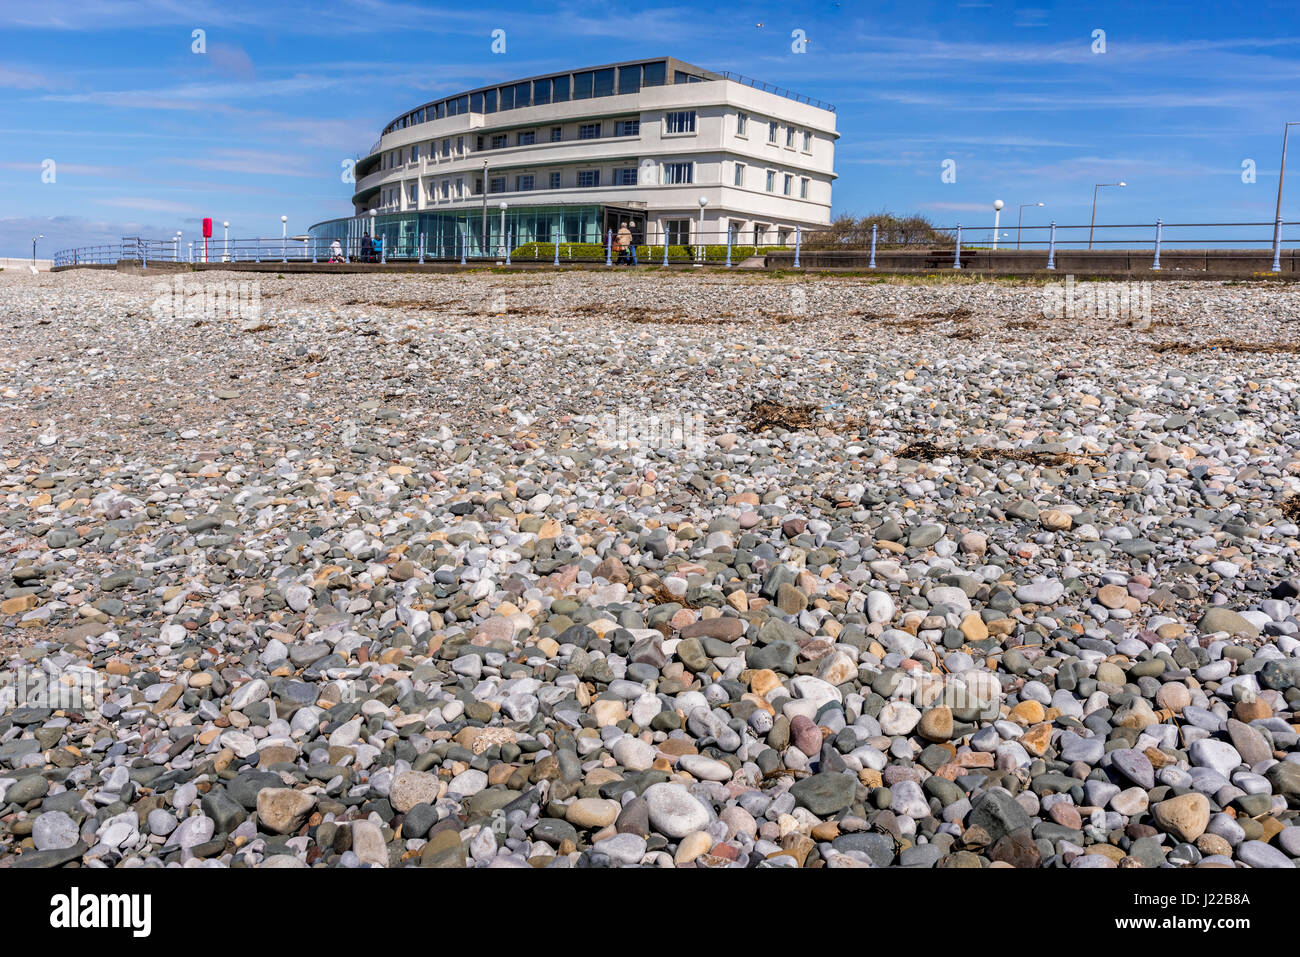 Art Deco Midland Hotel by the stony beach in Morecambe - Stock Image